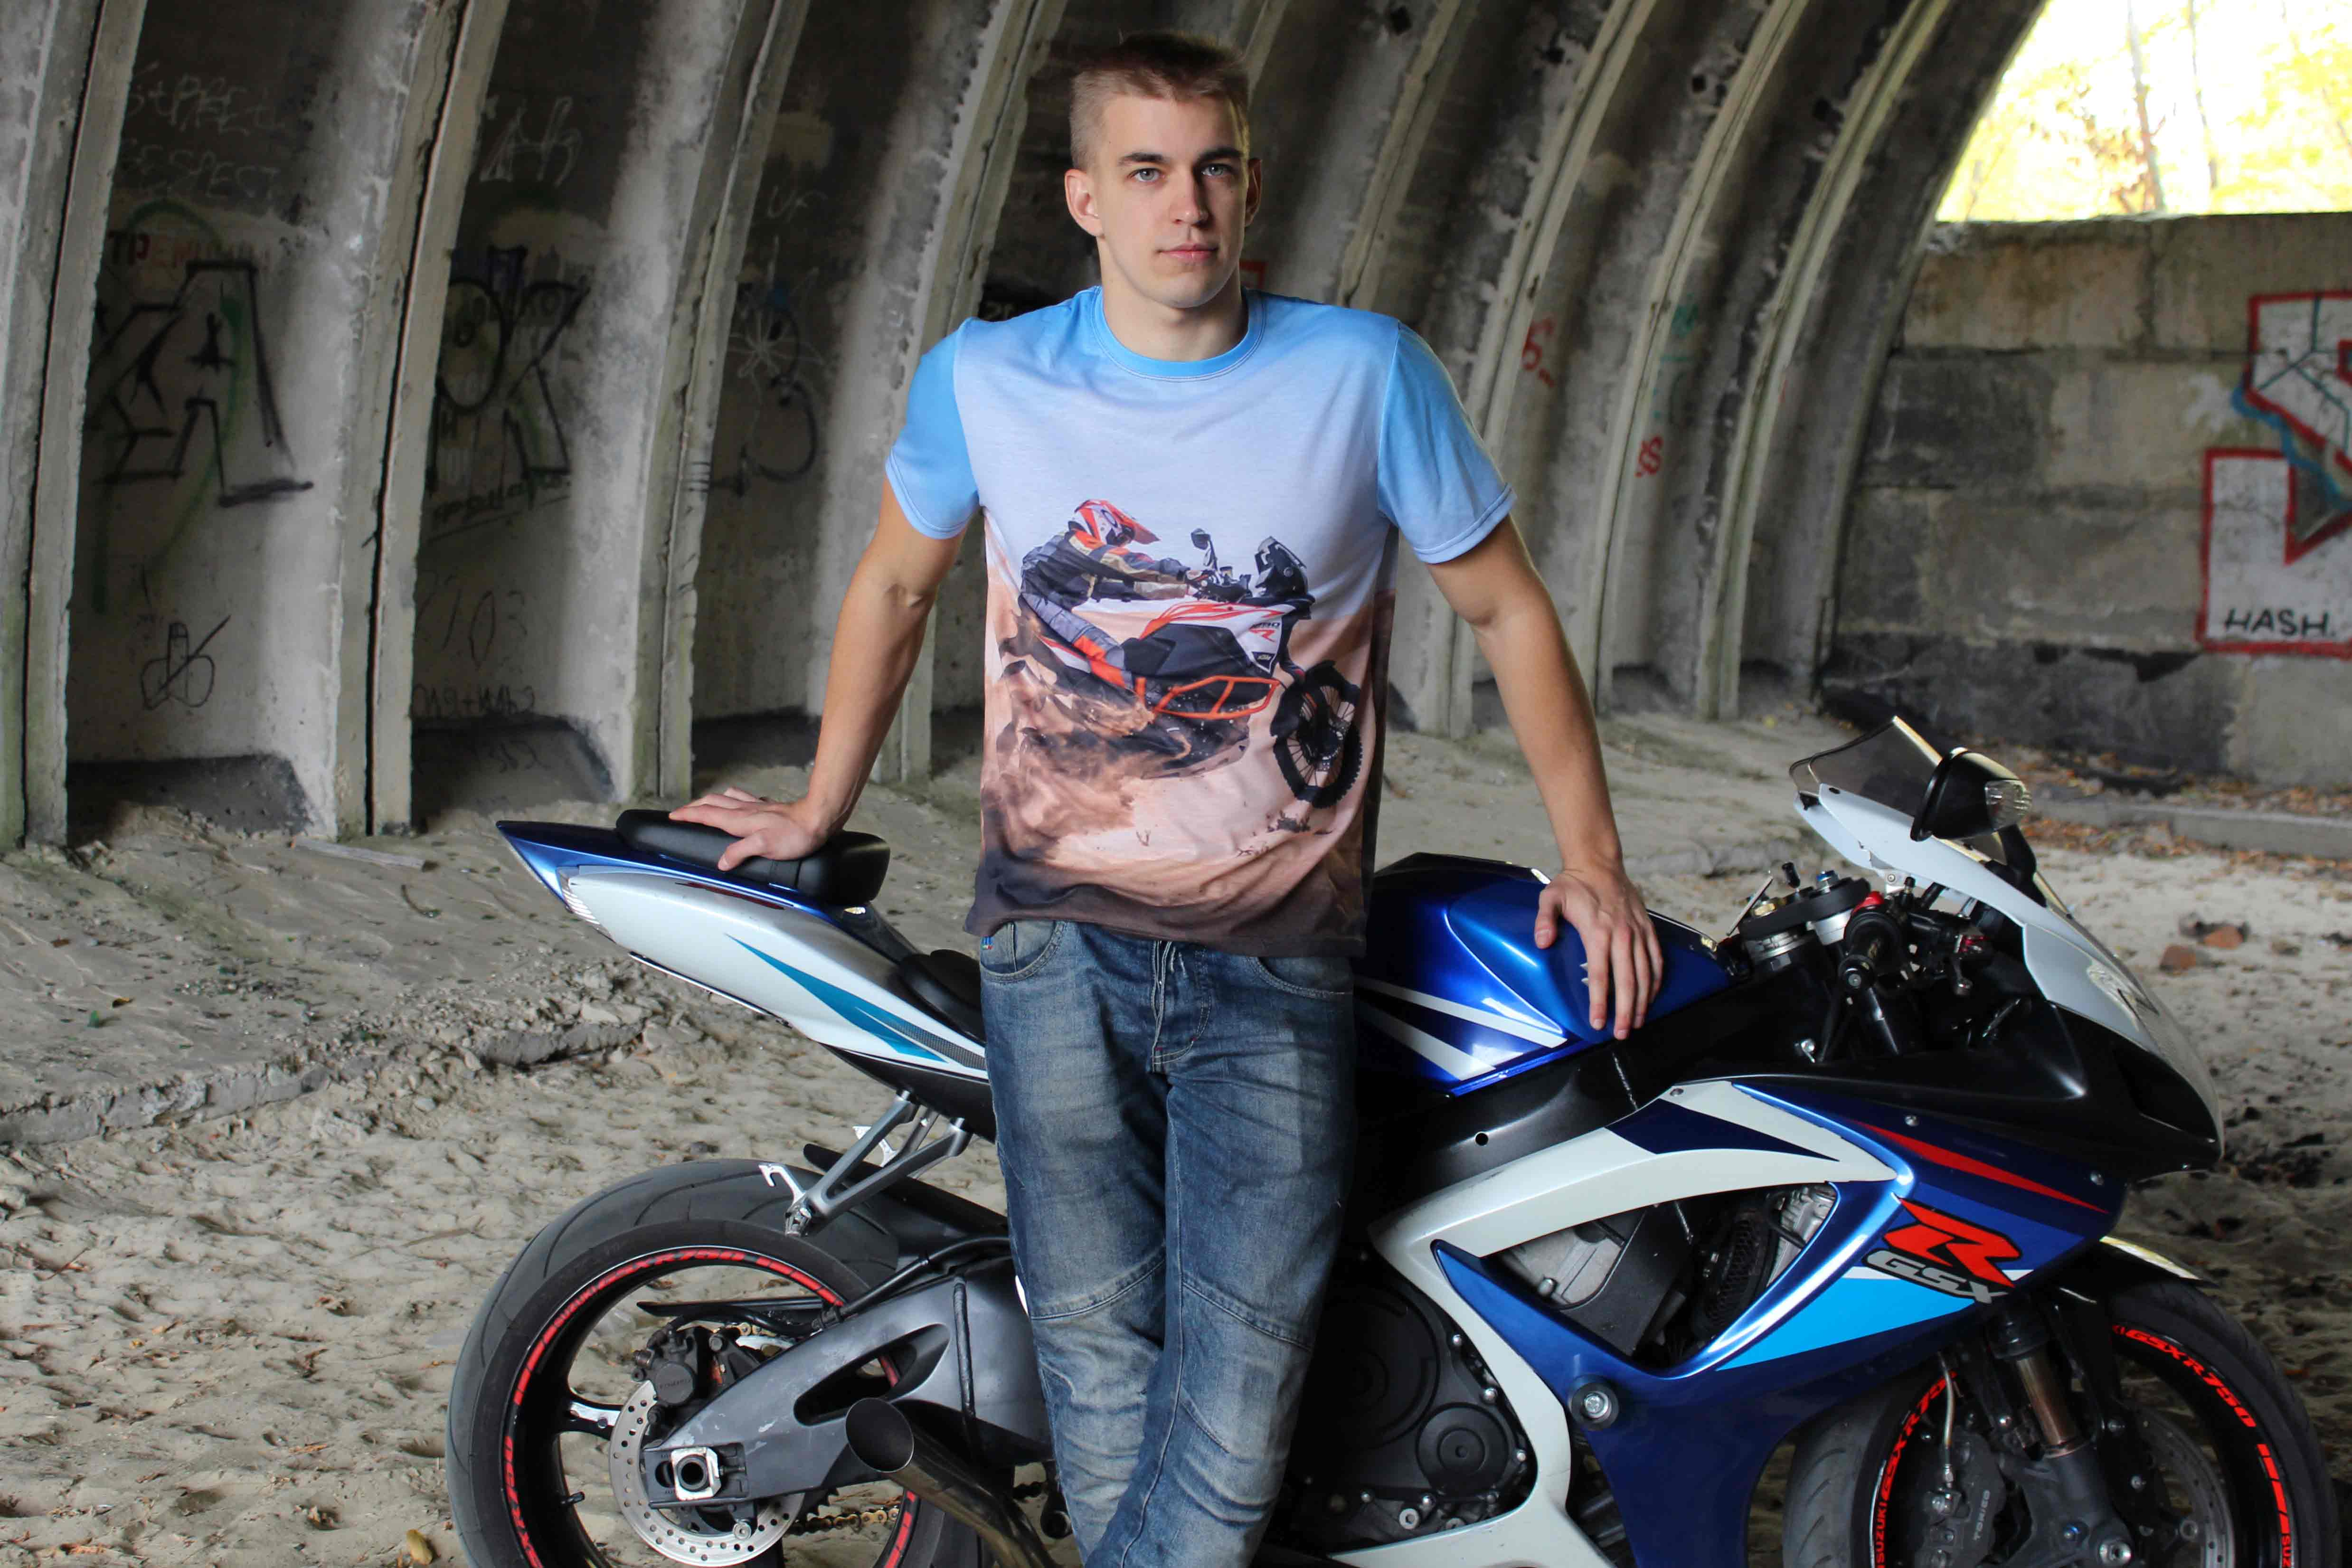 ФУТБОЛКА 4Y PRINT  Артмото - купить квадроцикл в украине и харькове, мотоцикл, снегоход, скутер, мопед, электромобиль